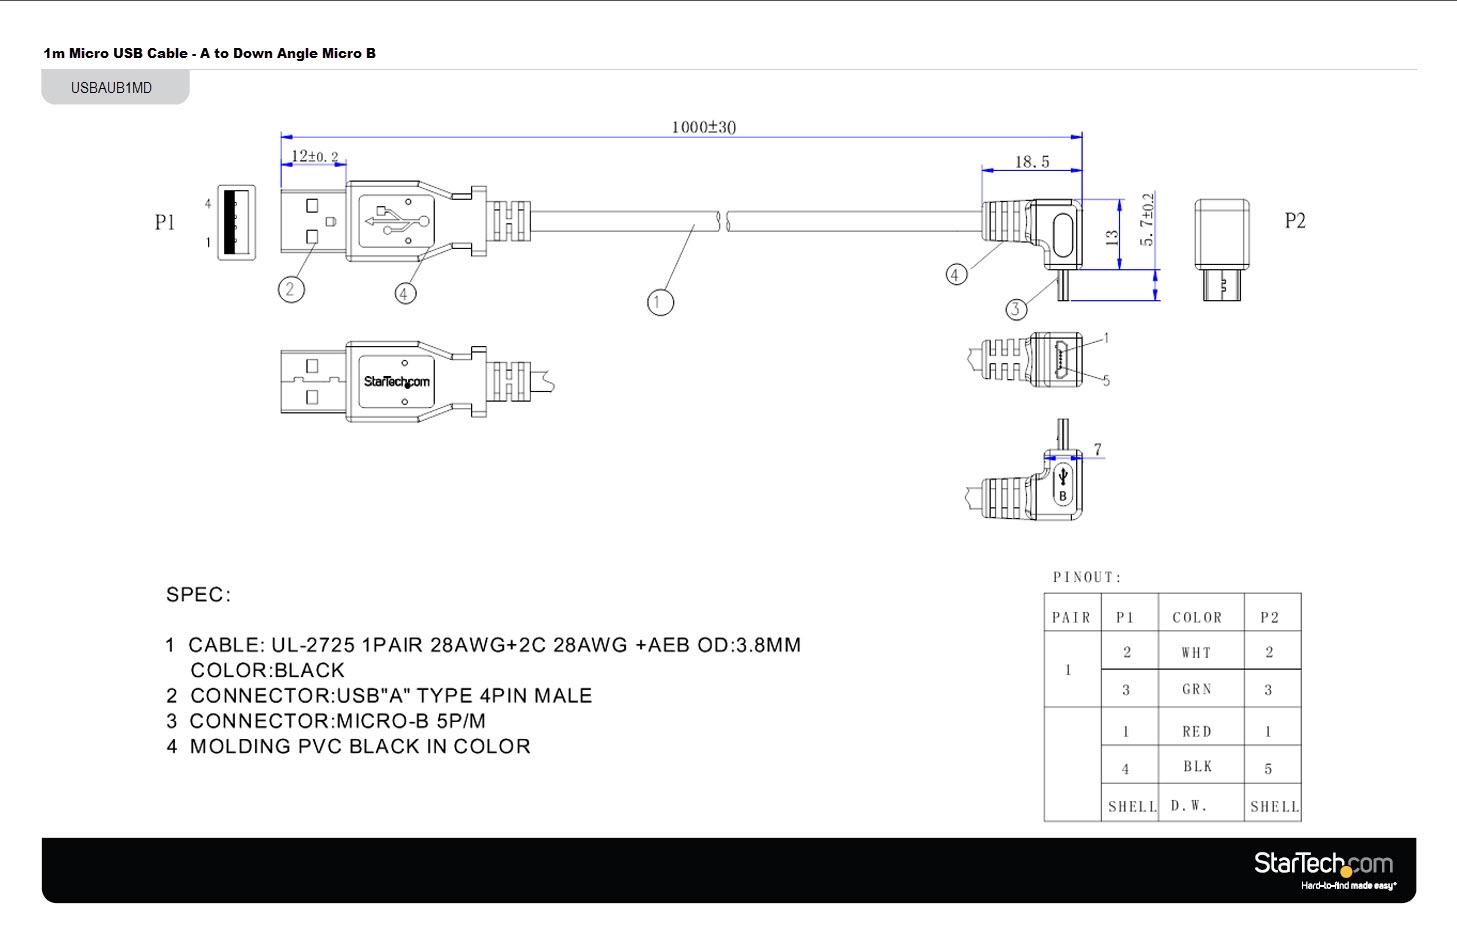 apc epo wiring diagram Download-Apc Epo Wiring Diagram Usb to Cat5 Wiring Diagram New 1m Usb to Down Angle 13-b